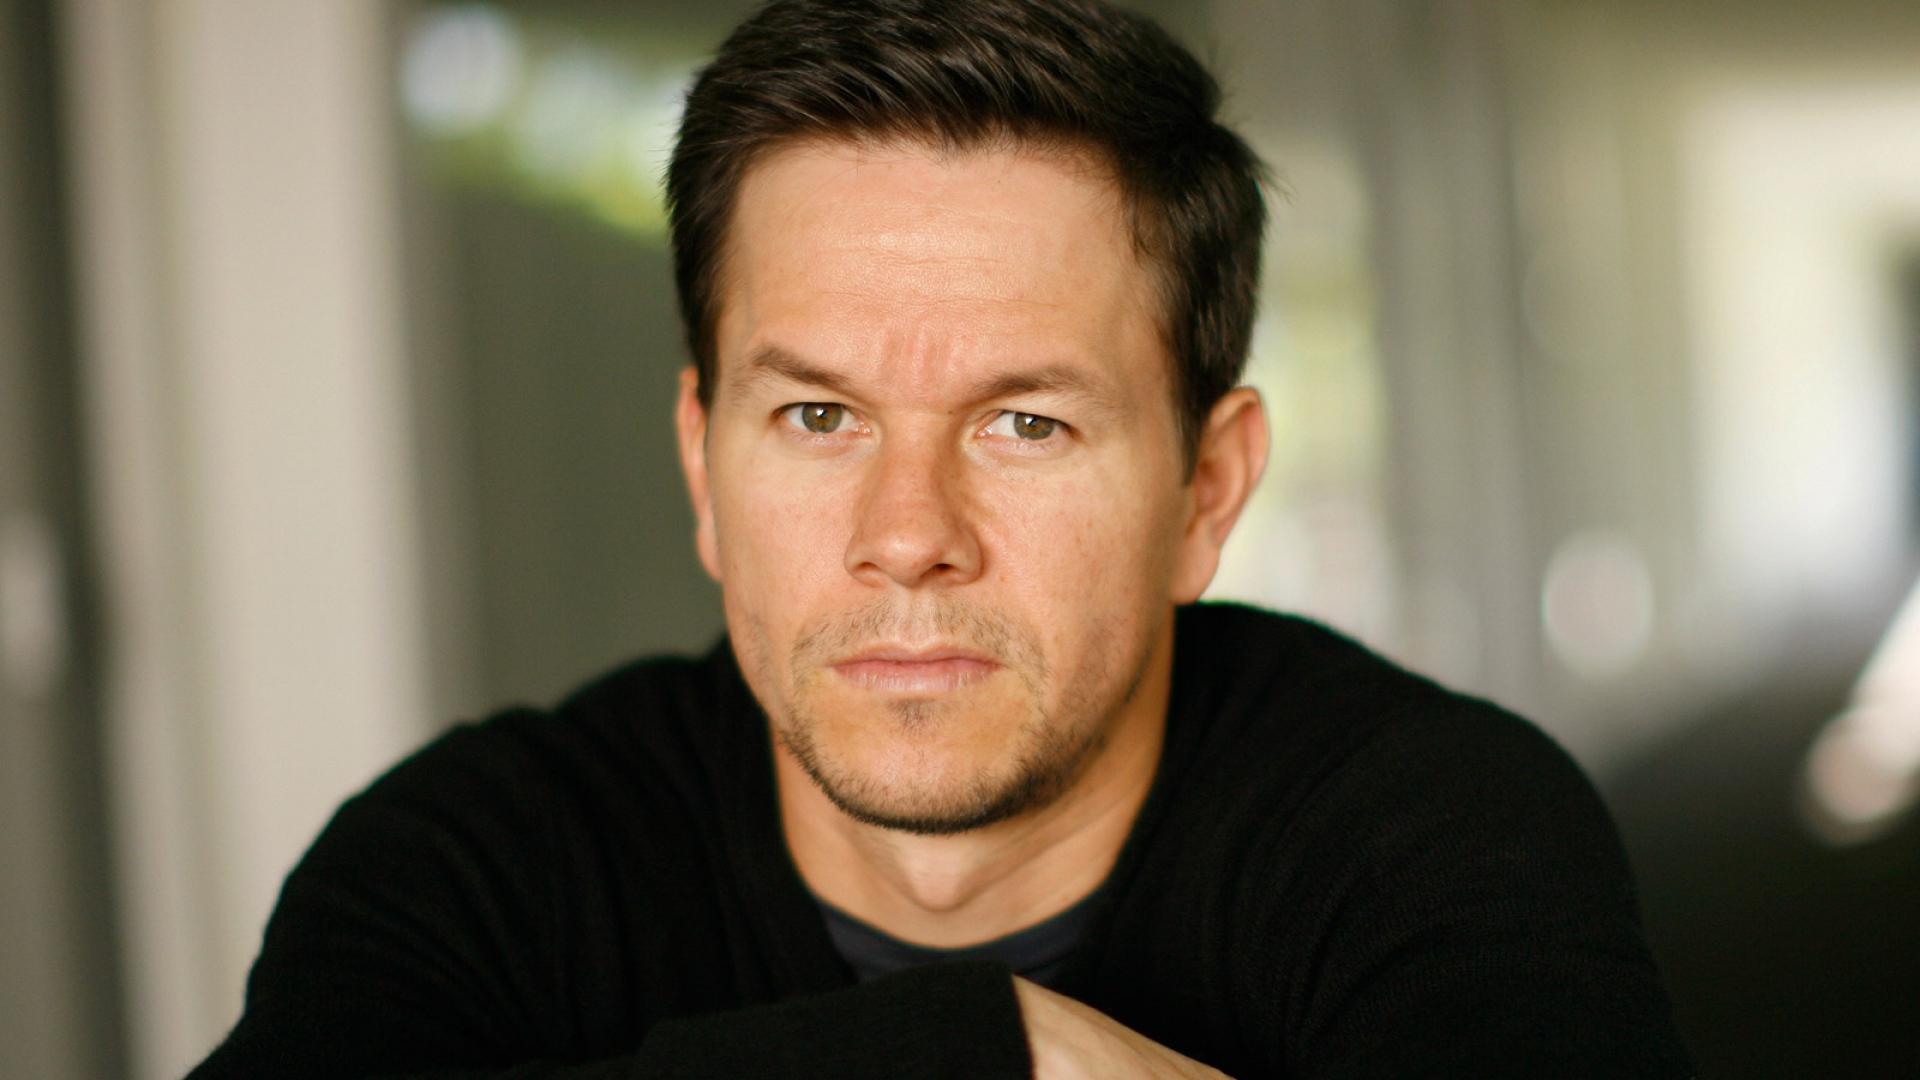 Mark Wahlberg Iphone Wallpaper